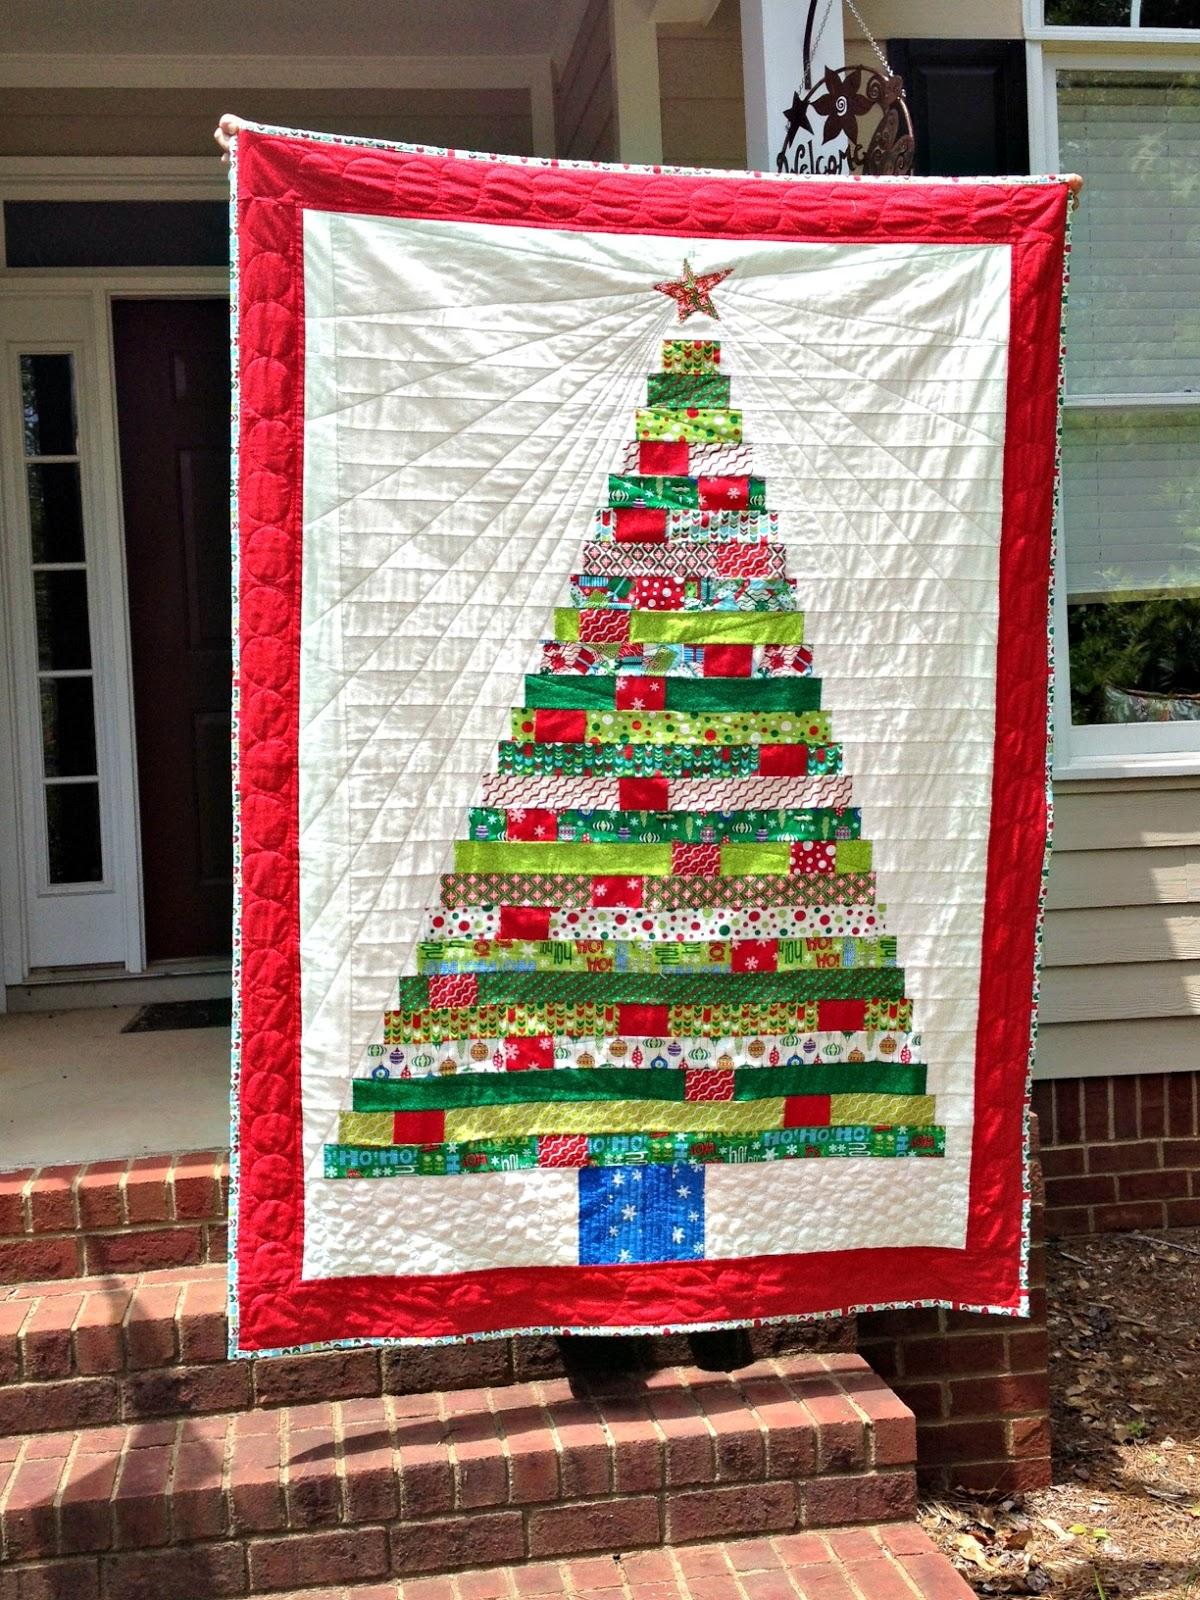 Christmas Quilt Patterns Moda : Studio Dragonfly: Holiday Tree Quilt on Moda Bake Shop